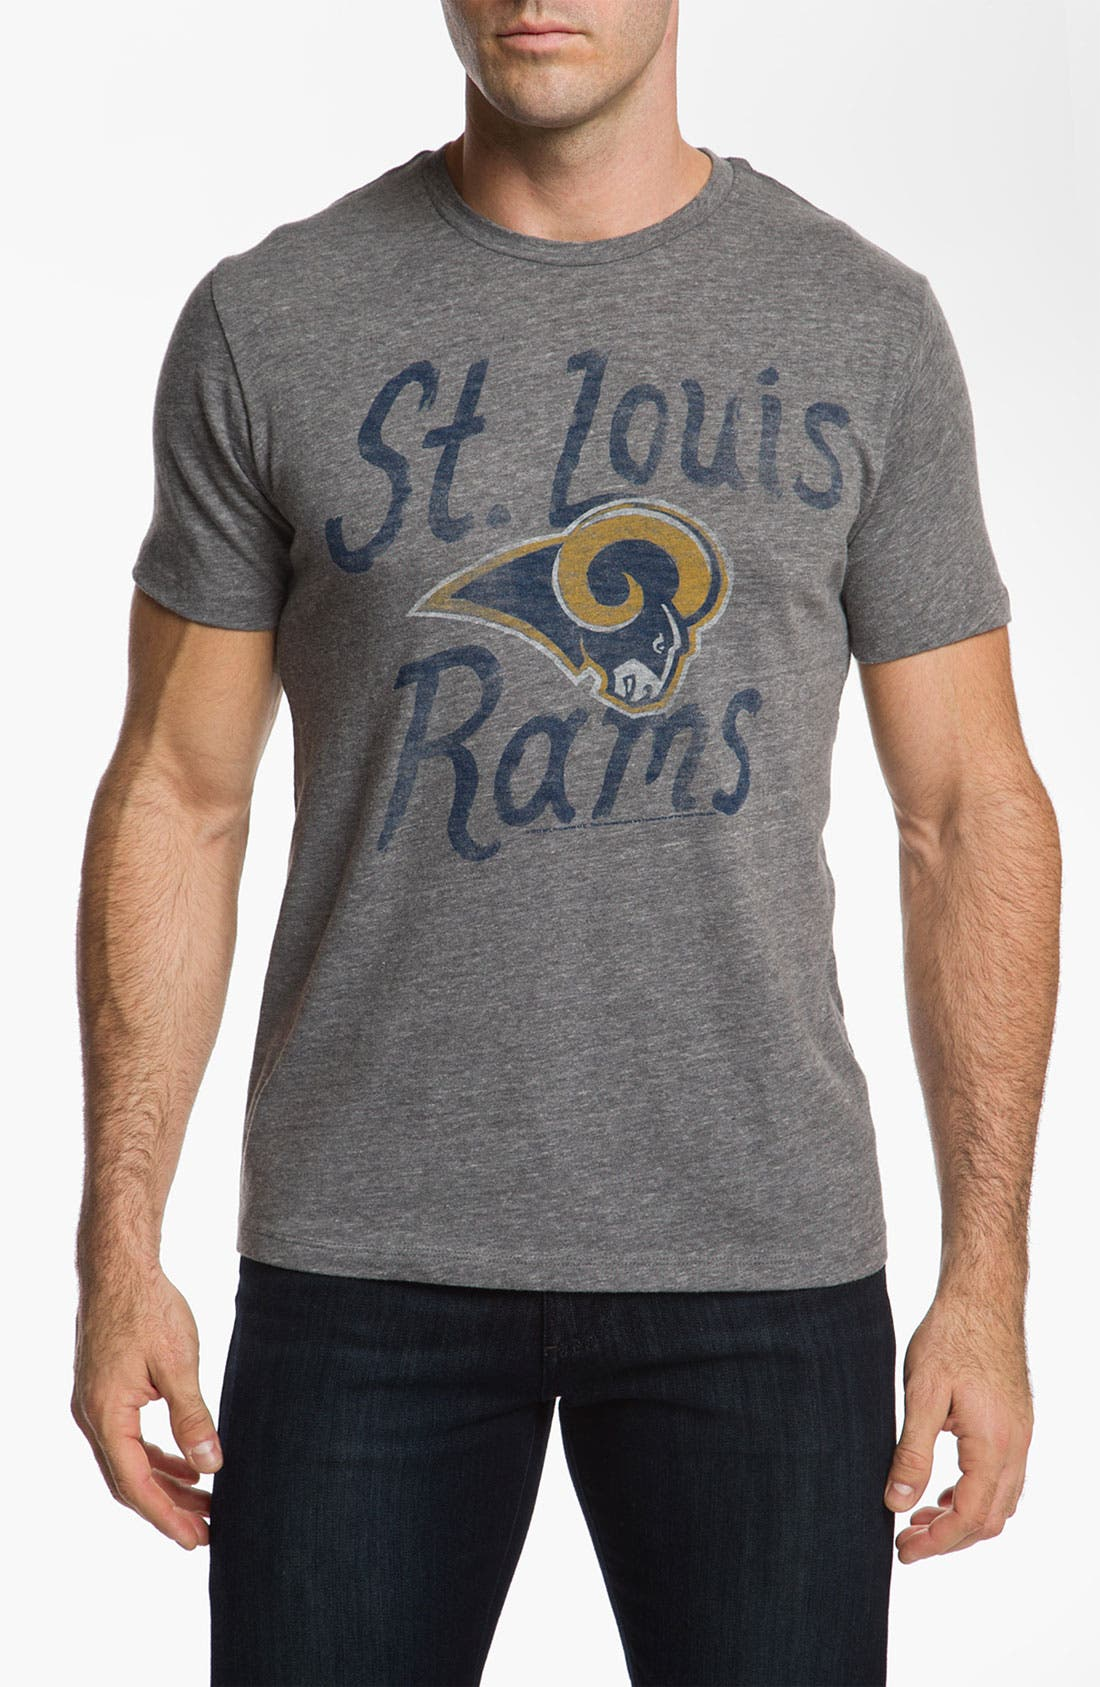 Main Image - Junk Food 'St. Louis Rams' T-Shirt